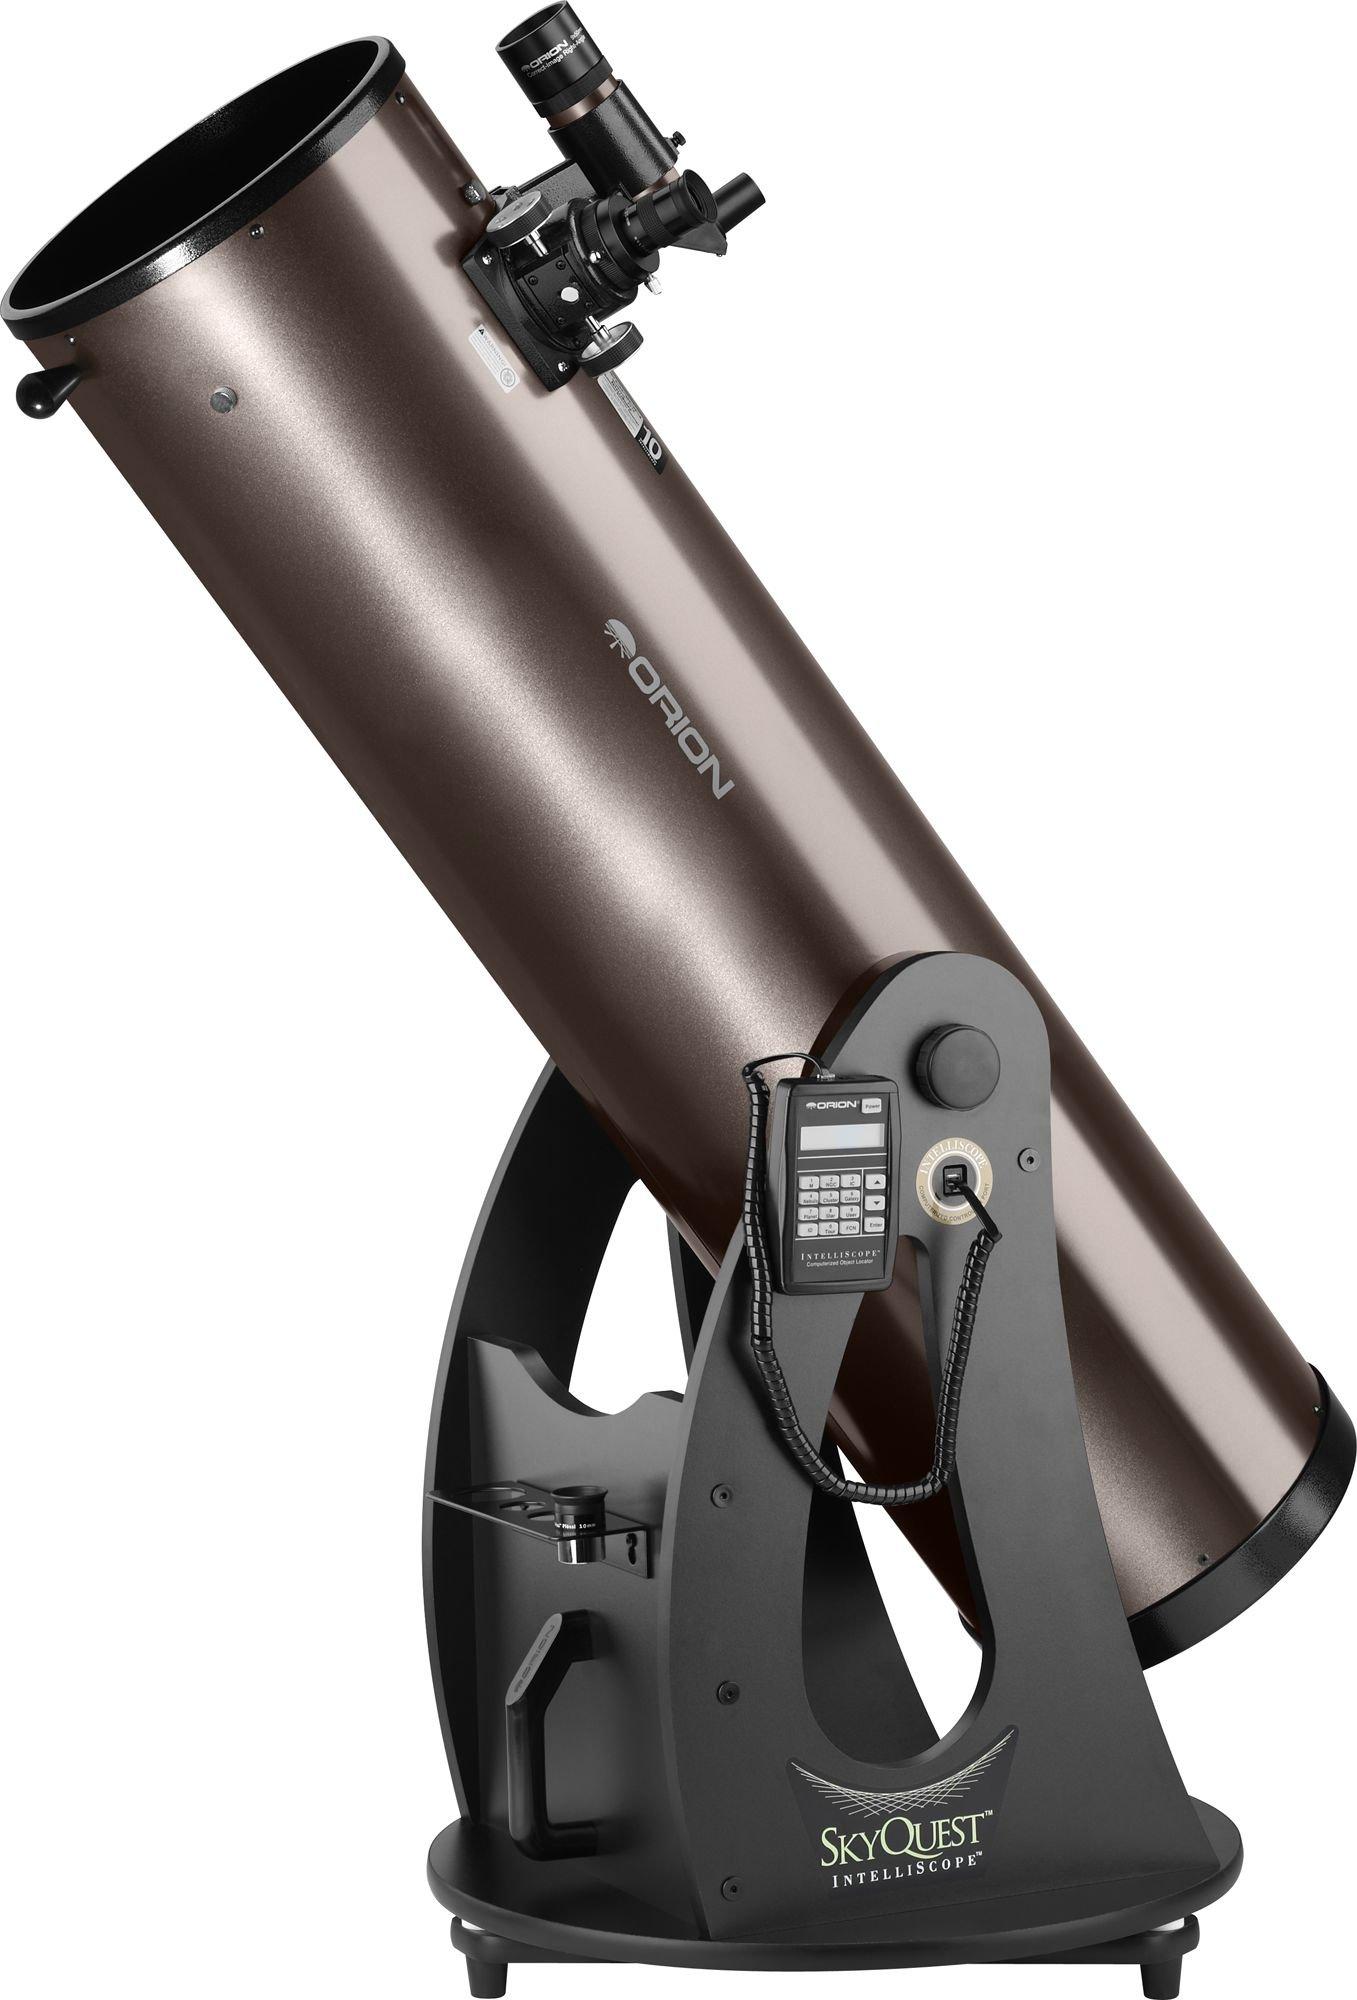 Telescopio dobsoniano Orion SkyQuest XT10i IntelliScope